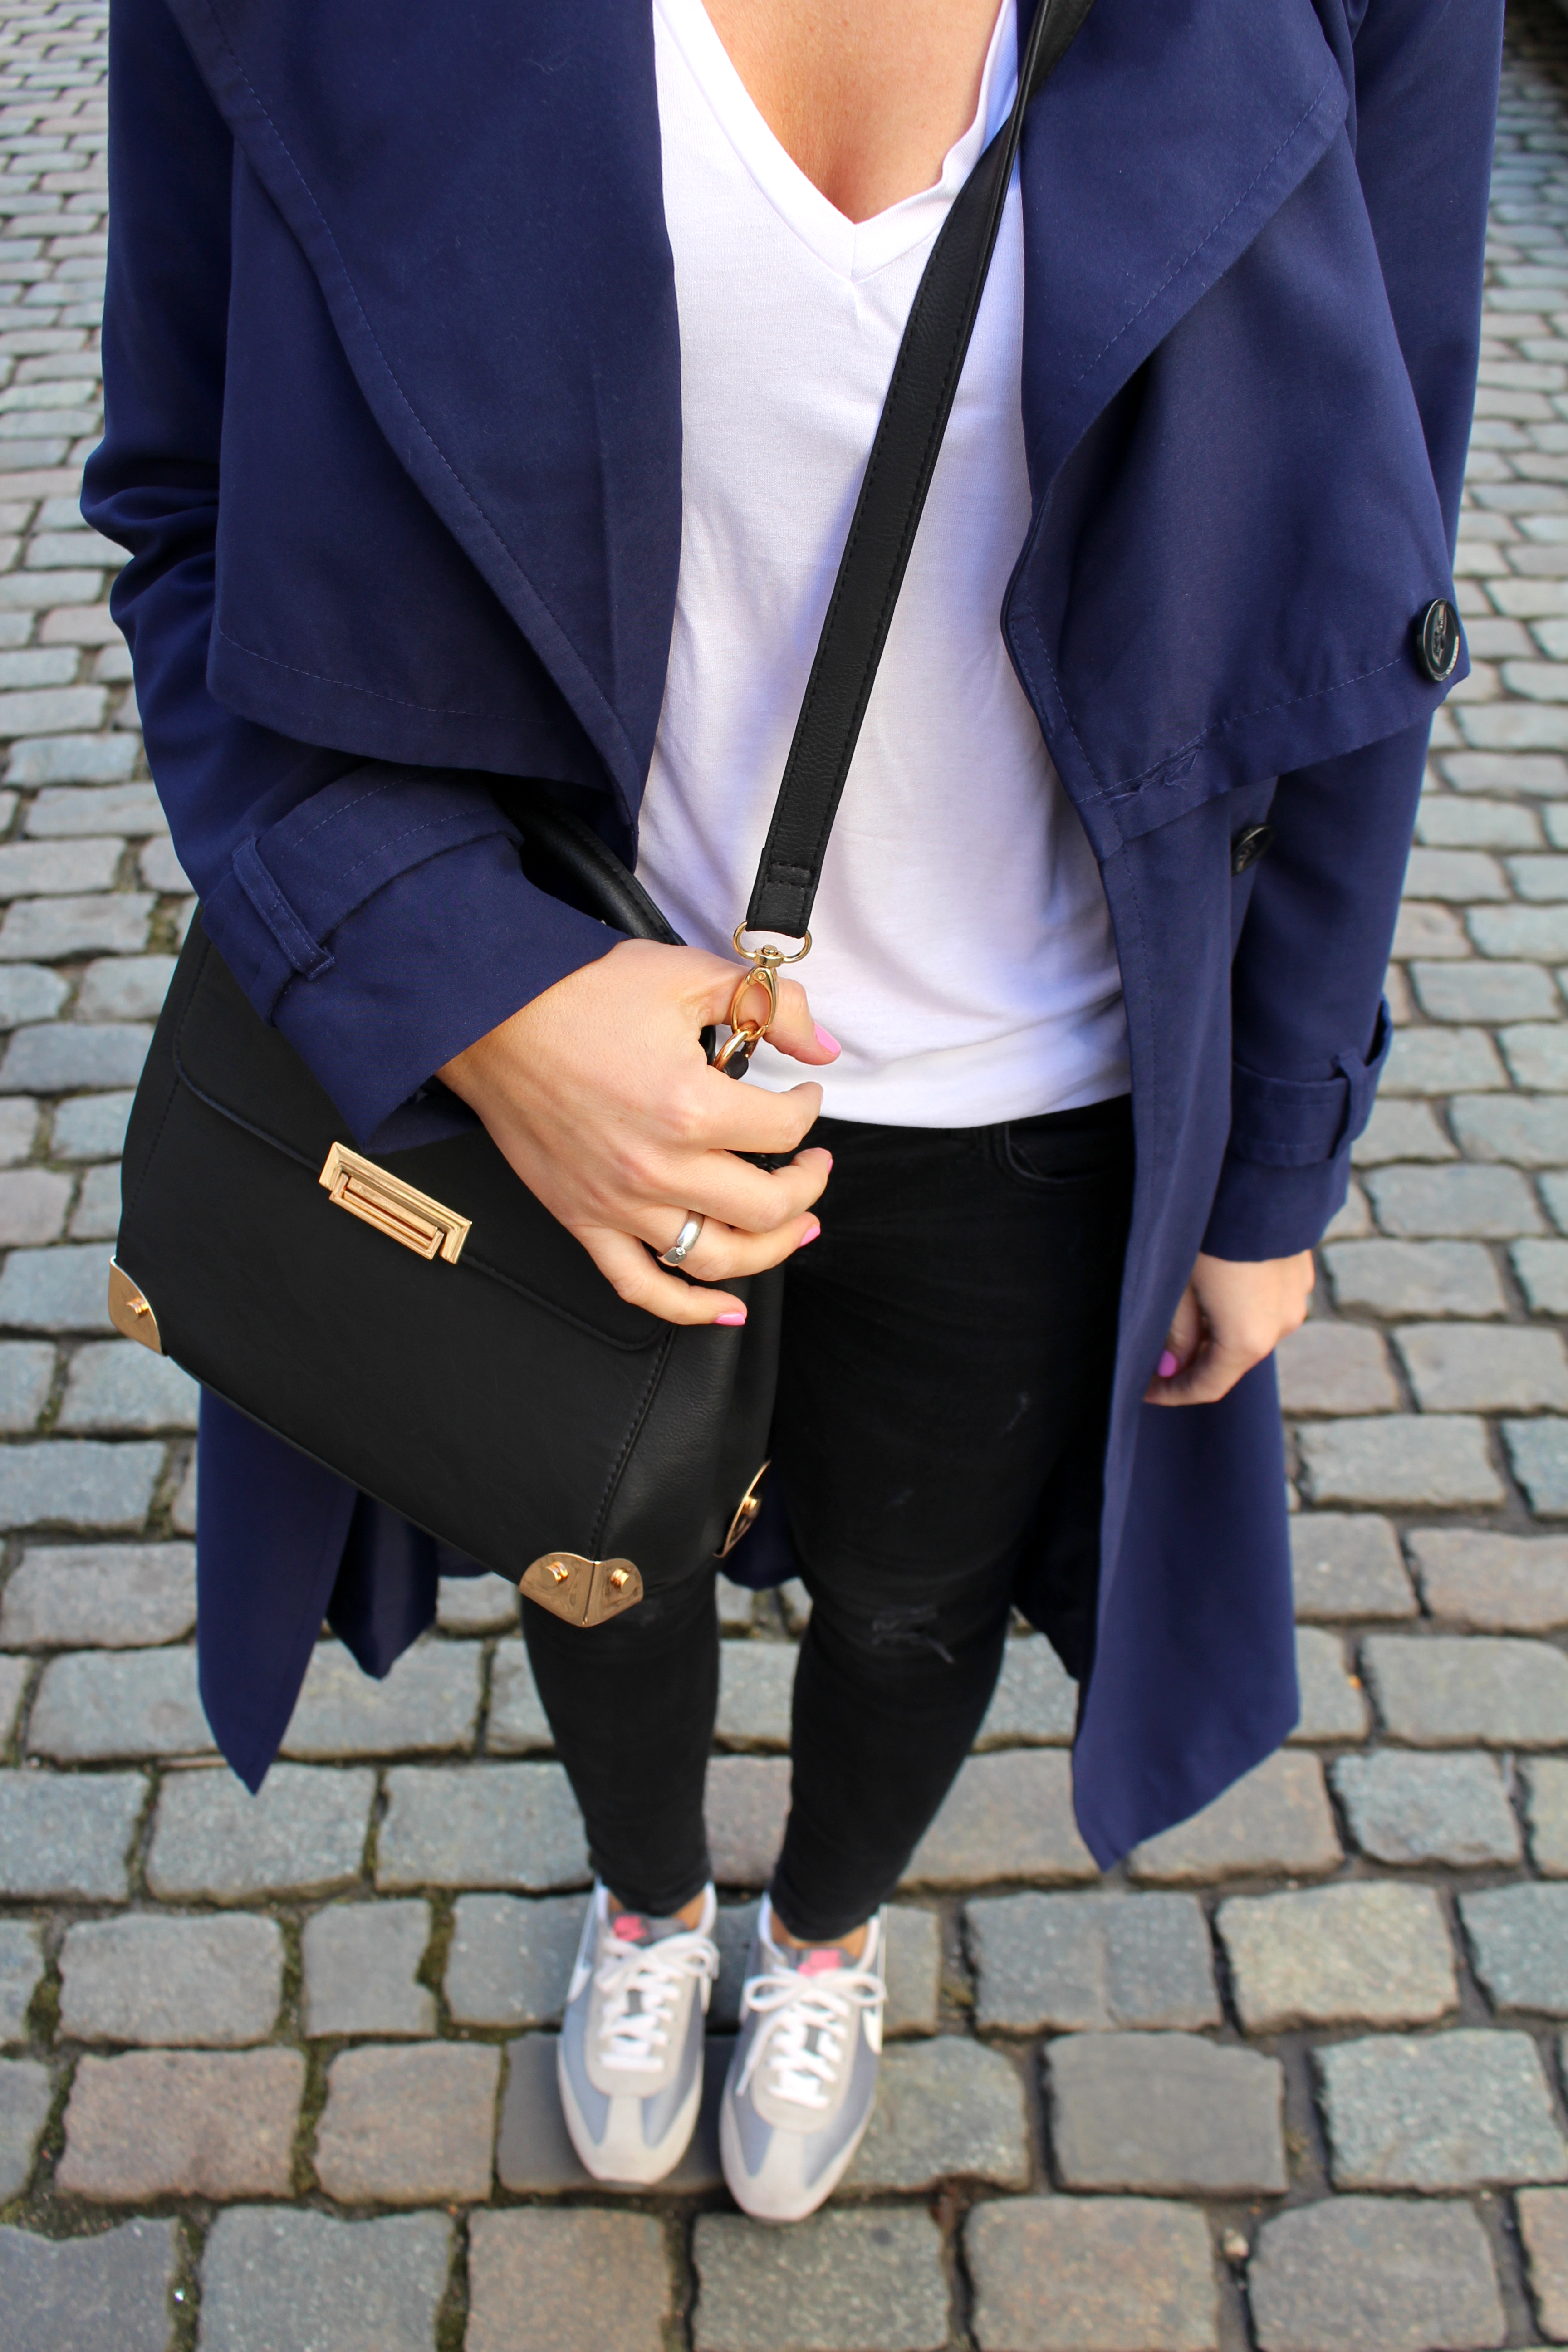 Fashioncircuz by Jenny img_2926 SHADES OF BLUE